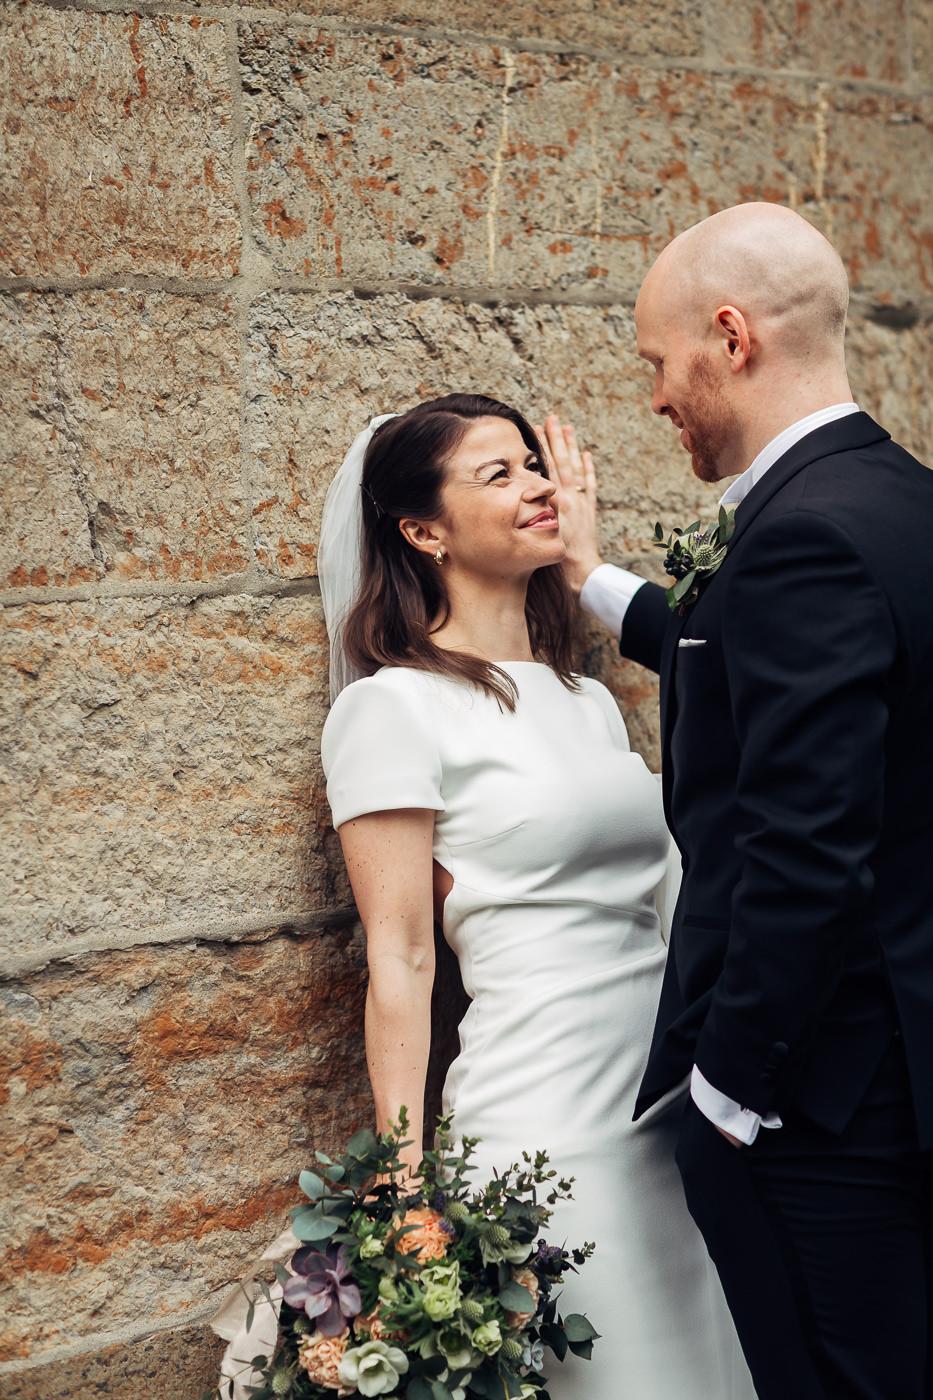 Malene & Ole Martin - elegant dansk- norskt bryllup i Oslo Bryllup Gamle Aker Oslo 42 Akershus